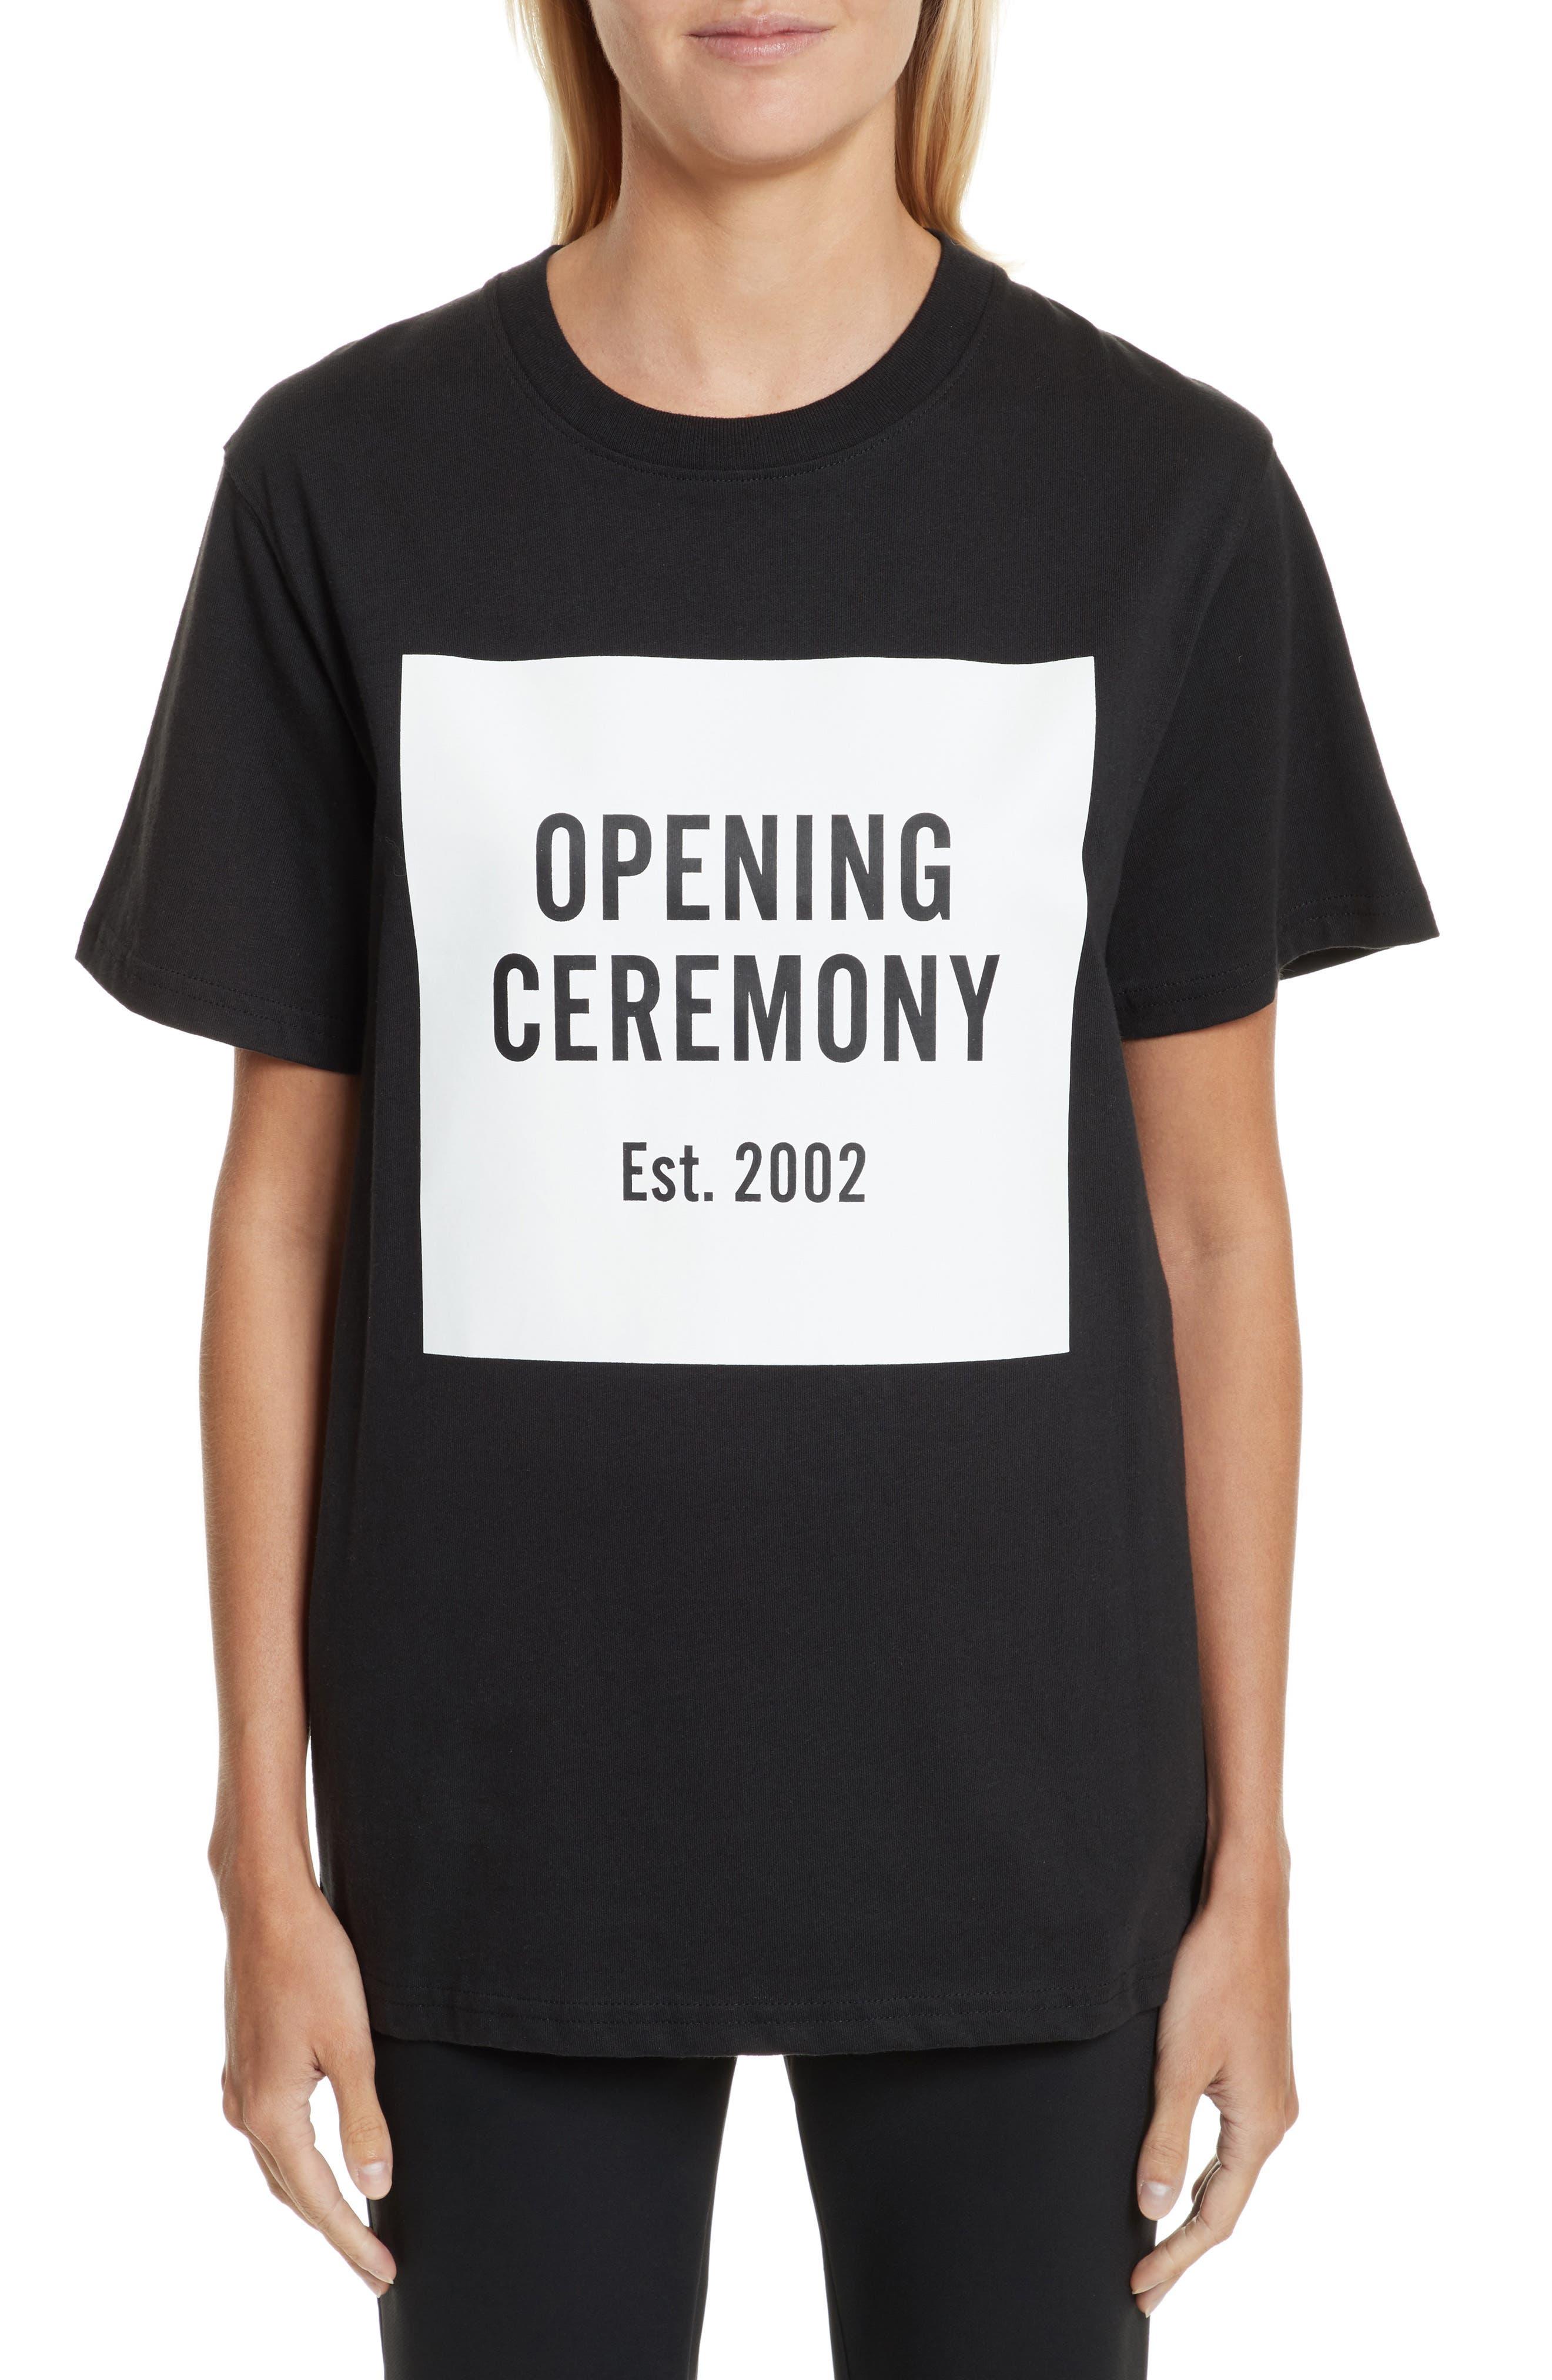 Opening Ceremony 'OC Logo' Short Sleeve T-Shirt